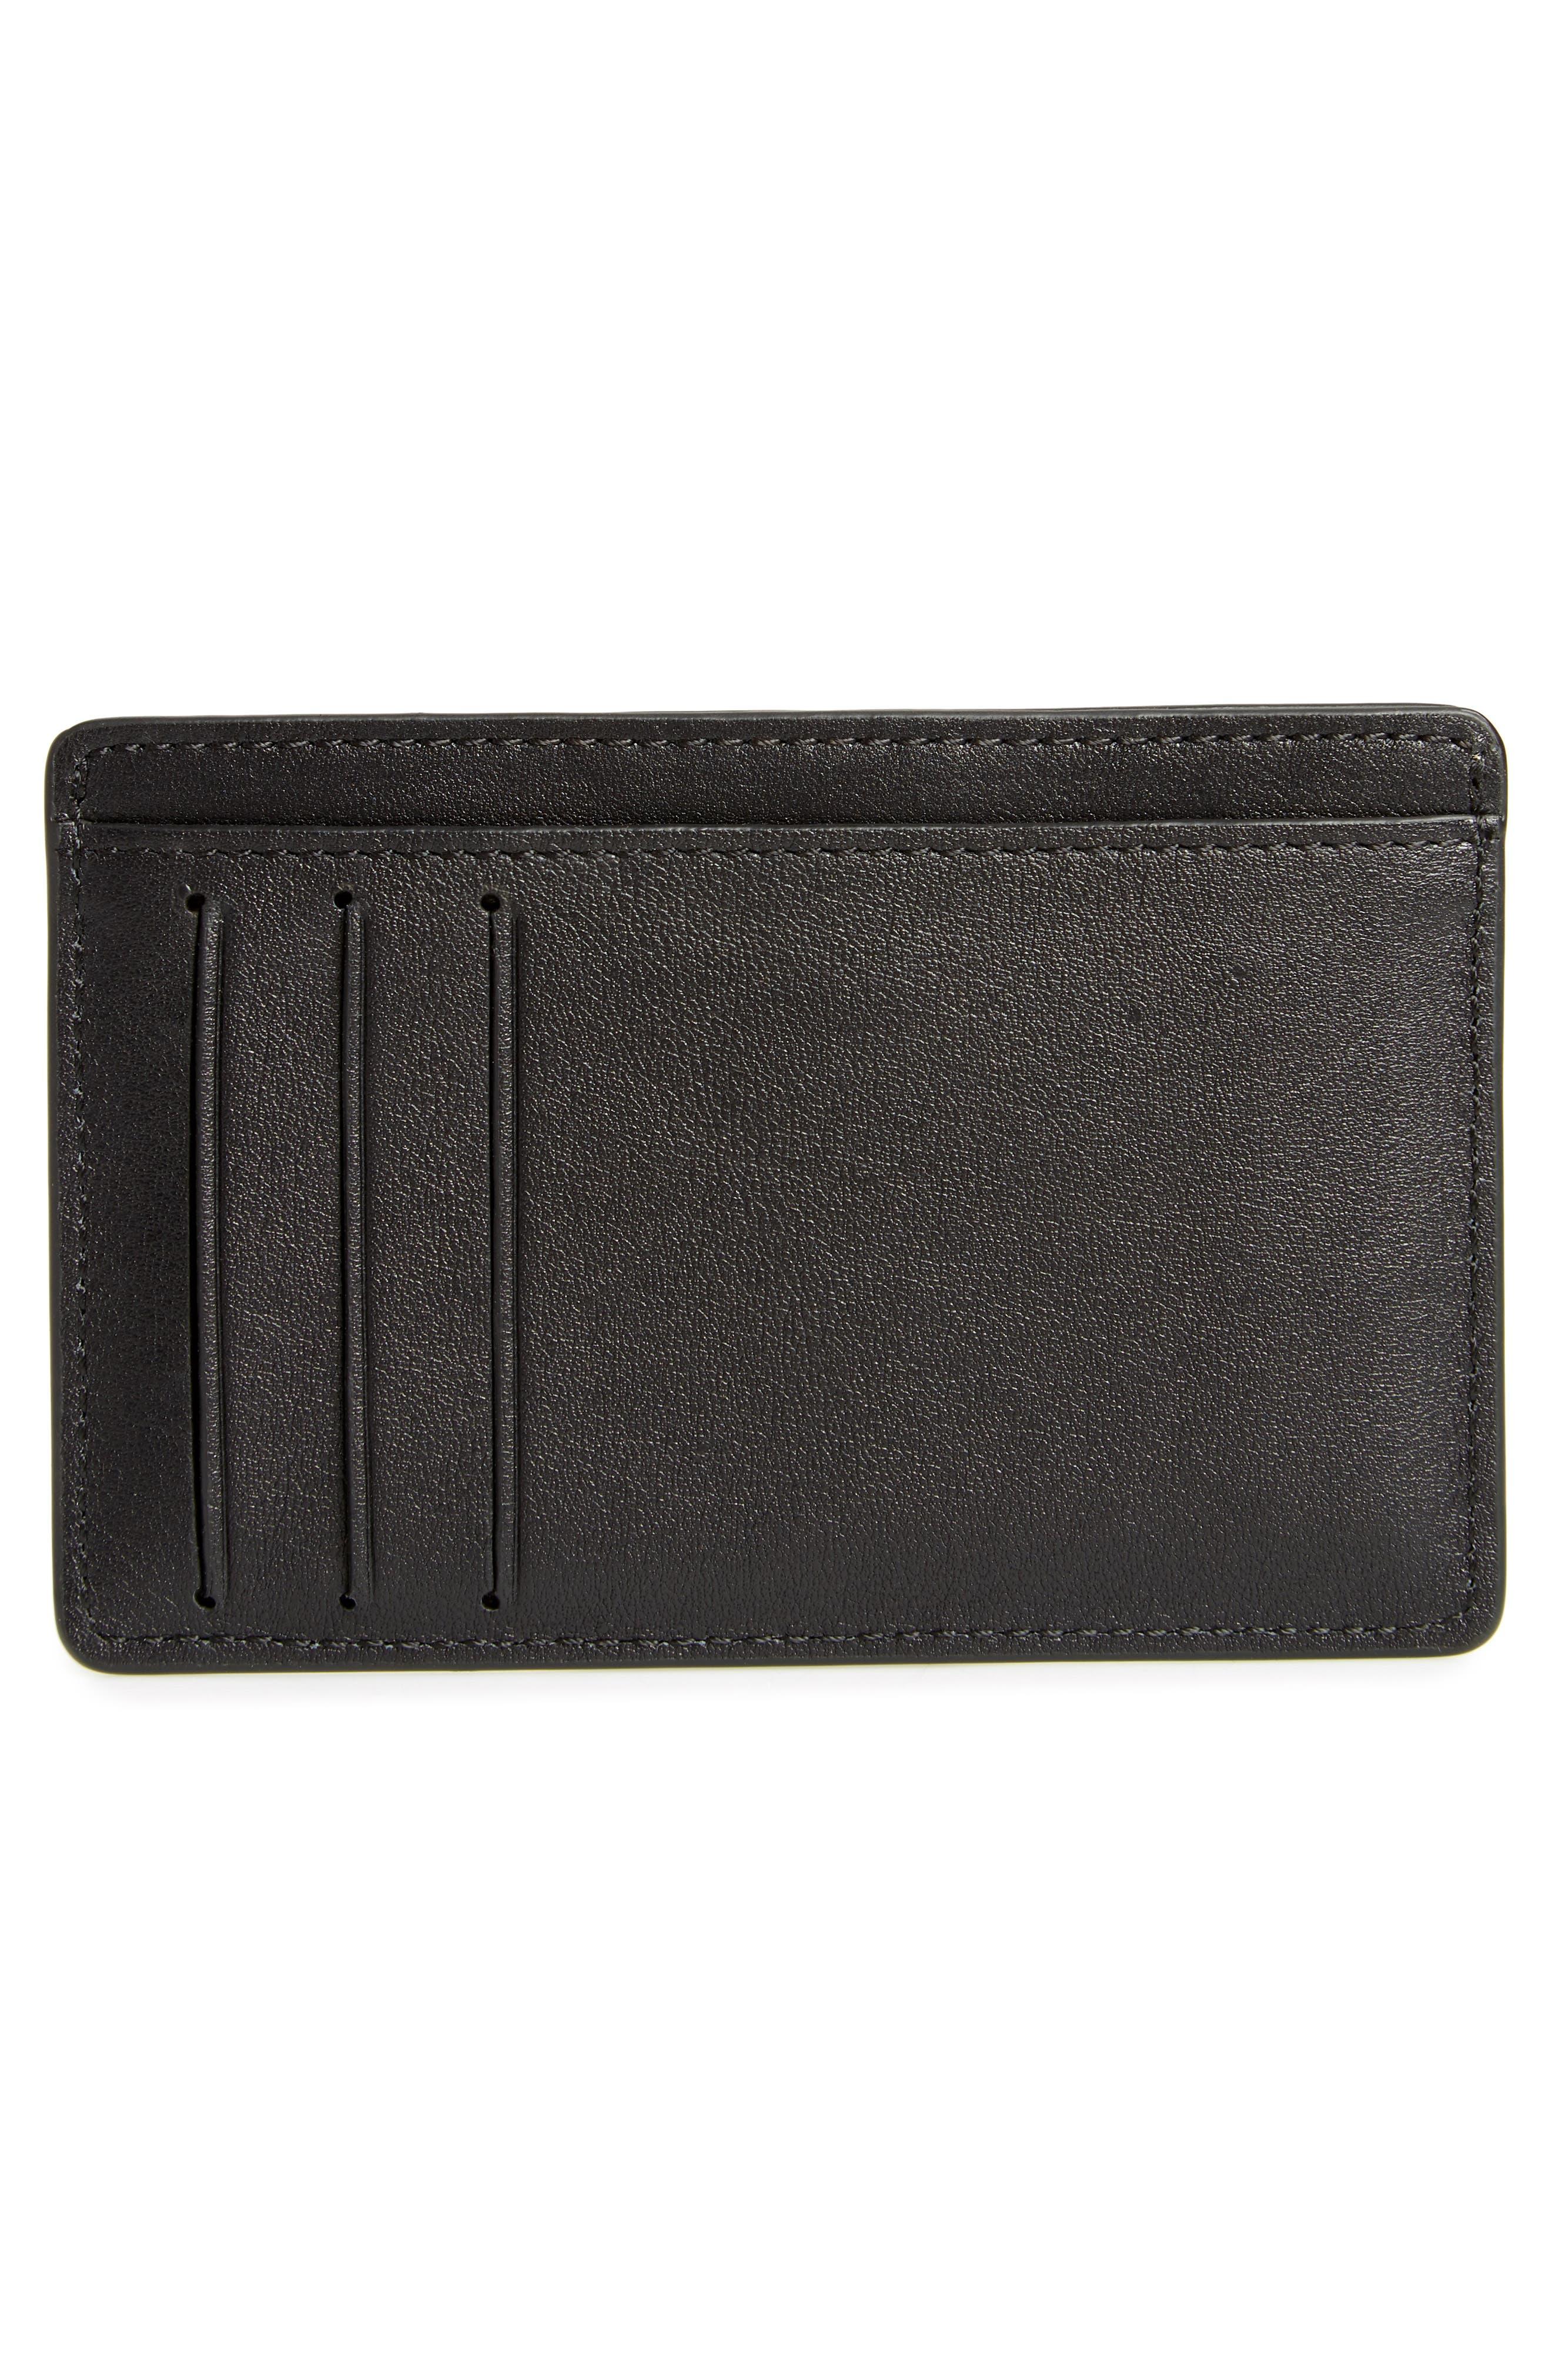 Leather Card Holder,                             Alternate thumbnail 2, color,                             001